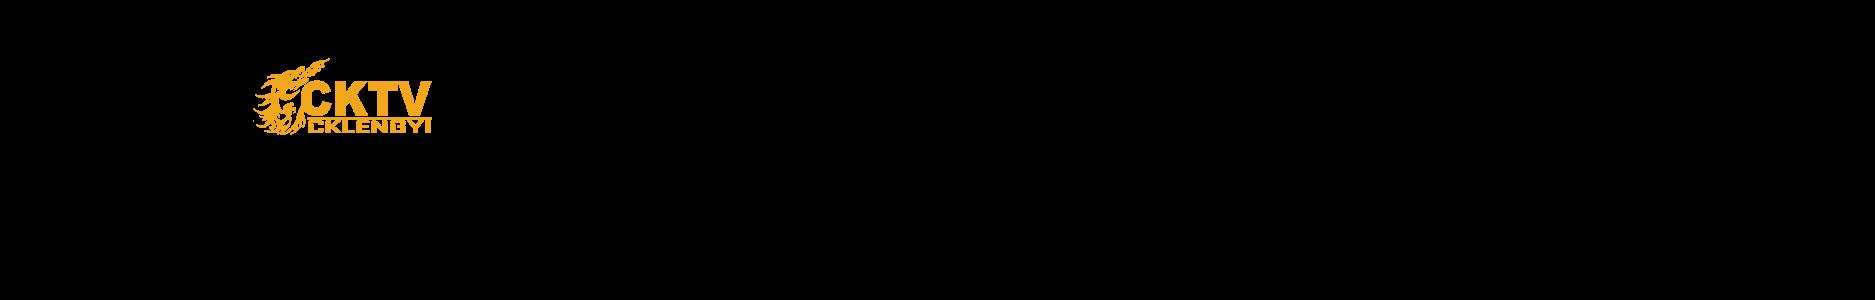 CKTV游戏视频 banner